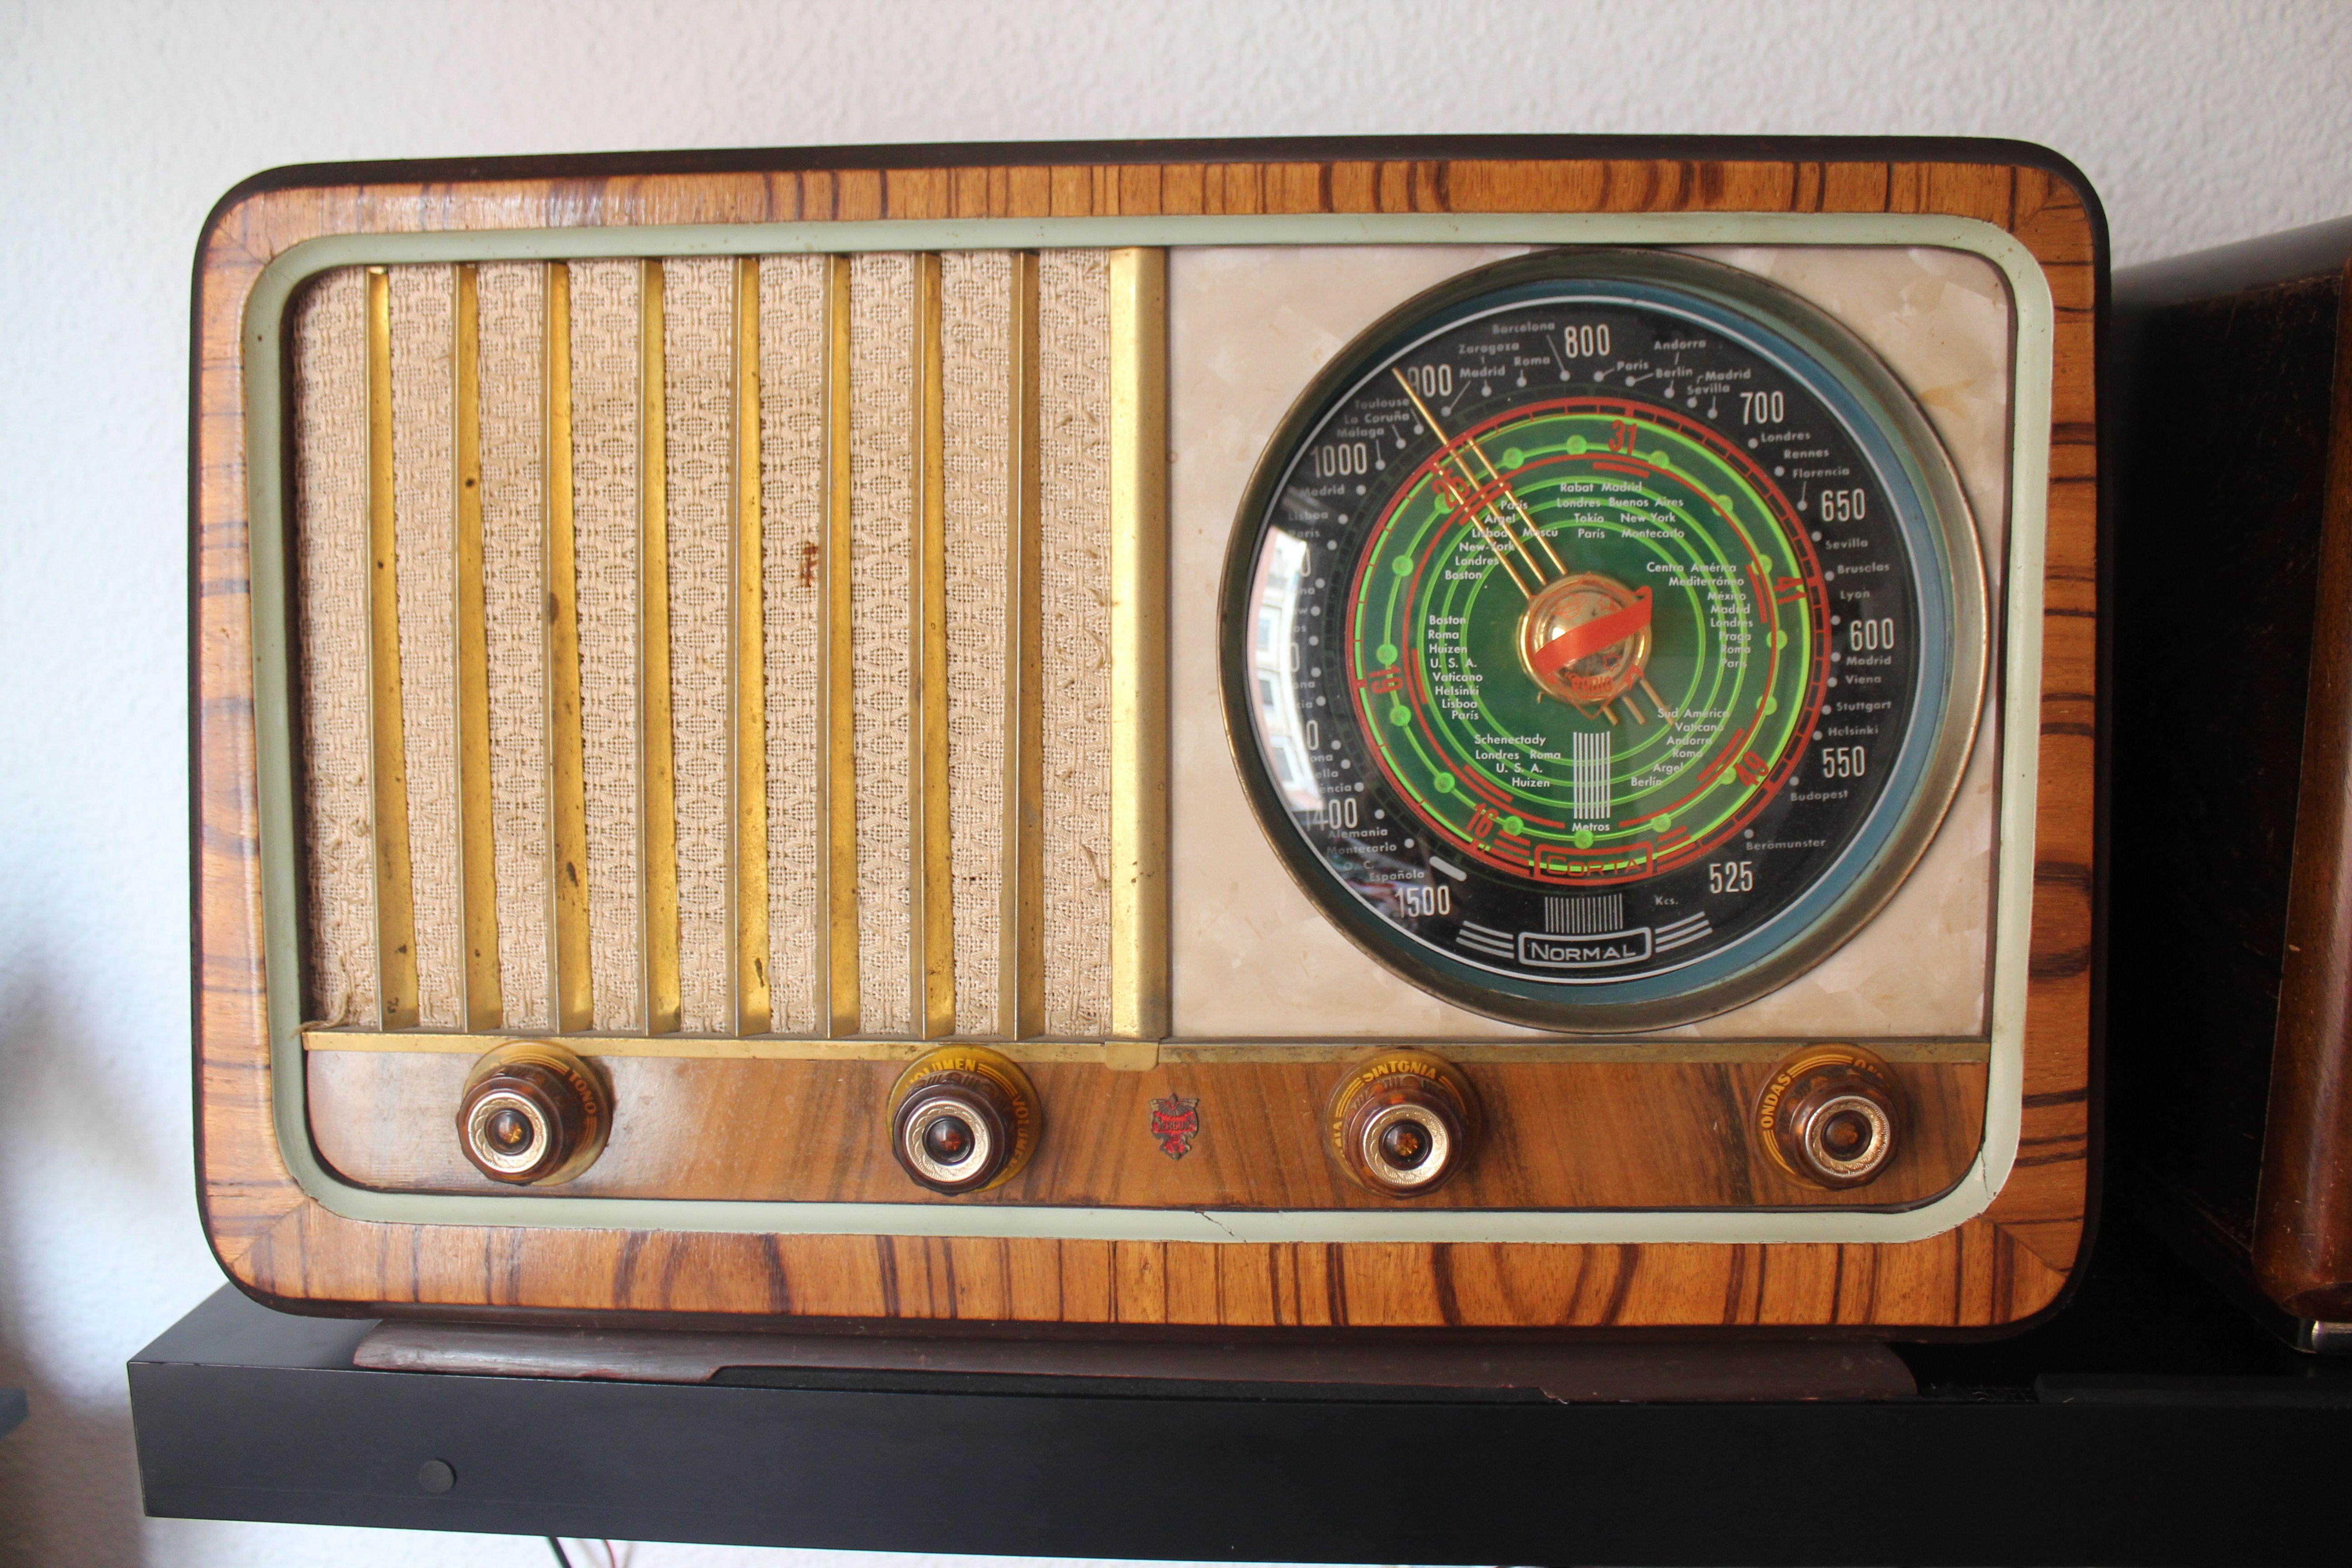 Mercury Radio Modelo 1026a 1955 Antique Radio Tube Radio Antique Radio Old Radios Radio